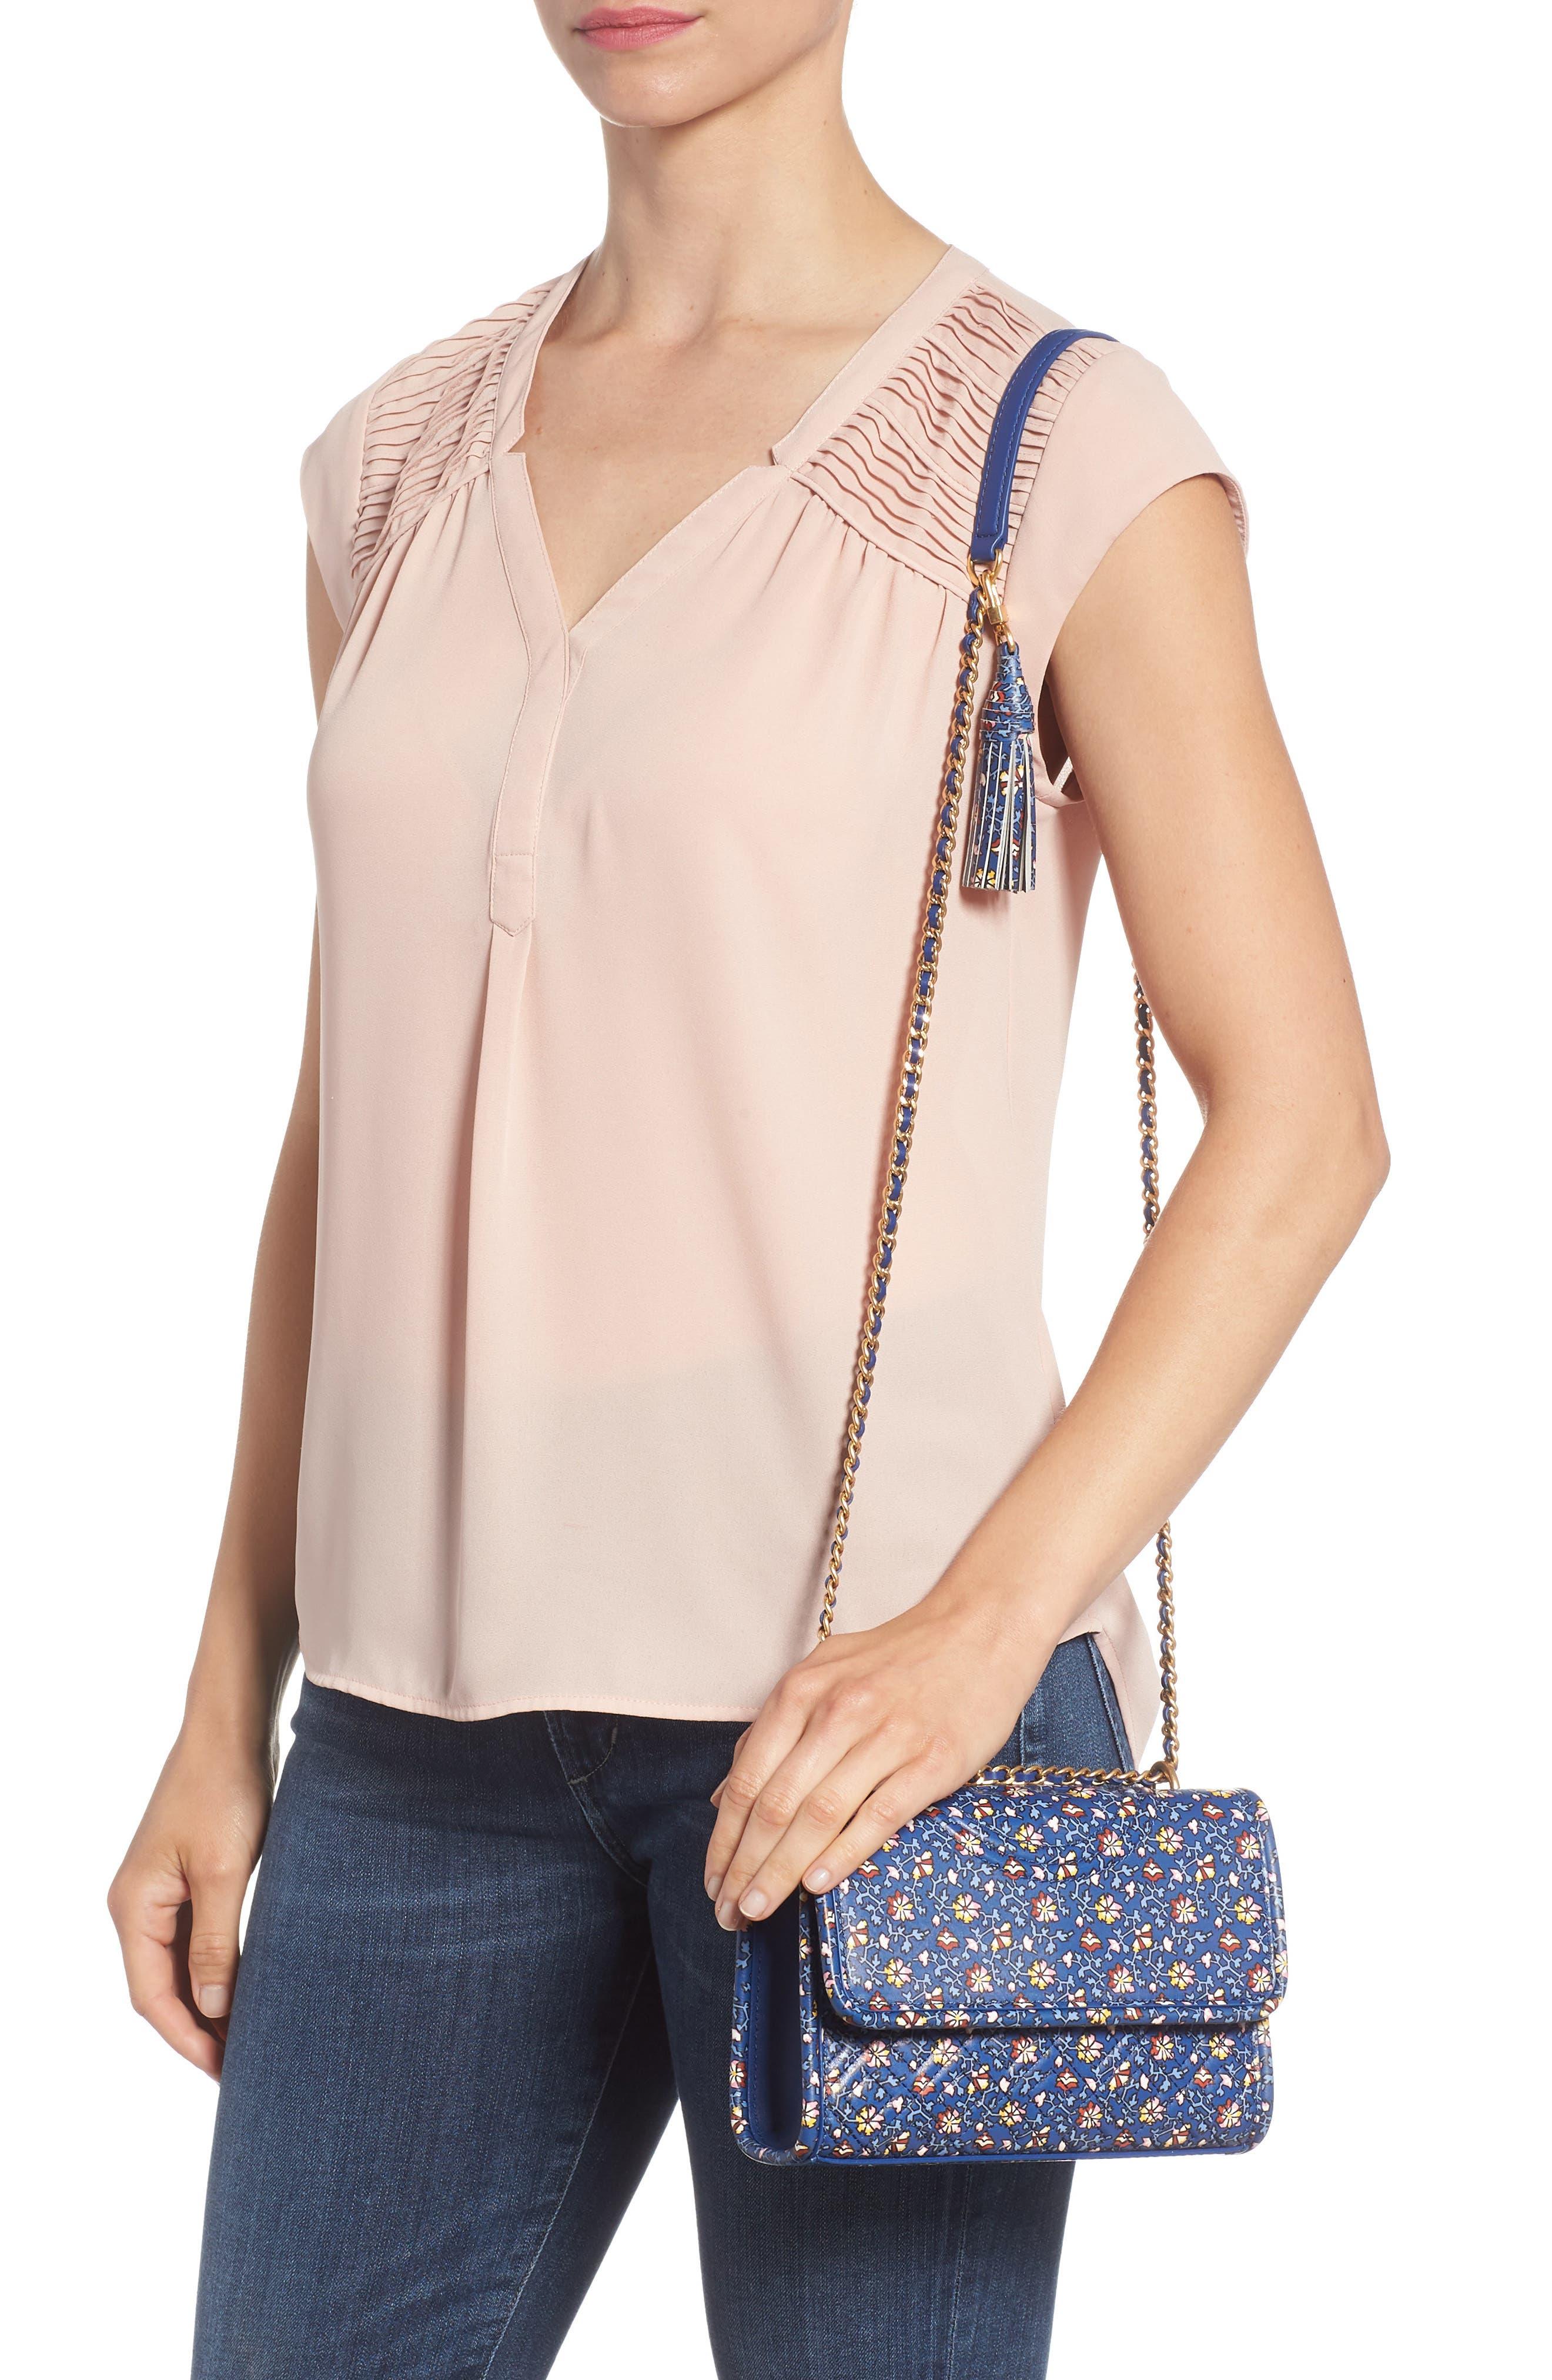 Fleming Print Leather Convertible Shoulder Bag,                             Alternate thumbnail 2, color,                             BLUE WILD PANSY